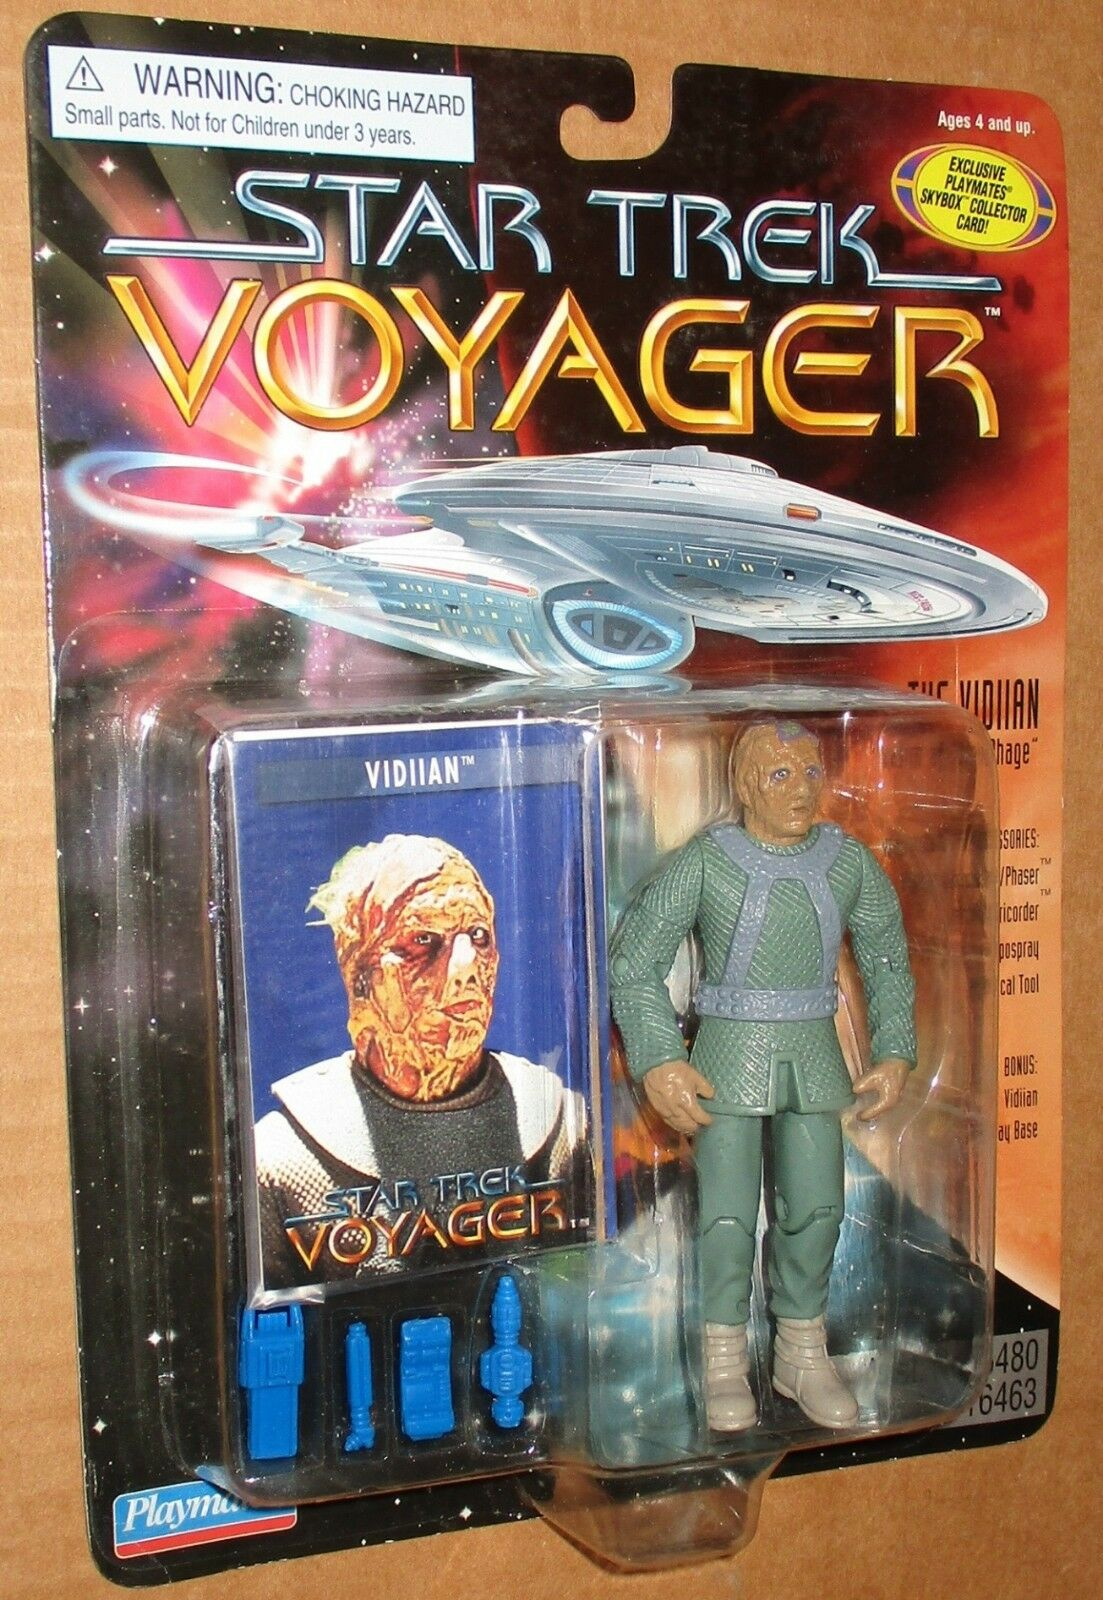 000002 Estrella Trek Voyager bajo número de la tarjeta figura Moc 1996 Jugarmates